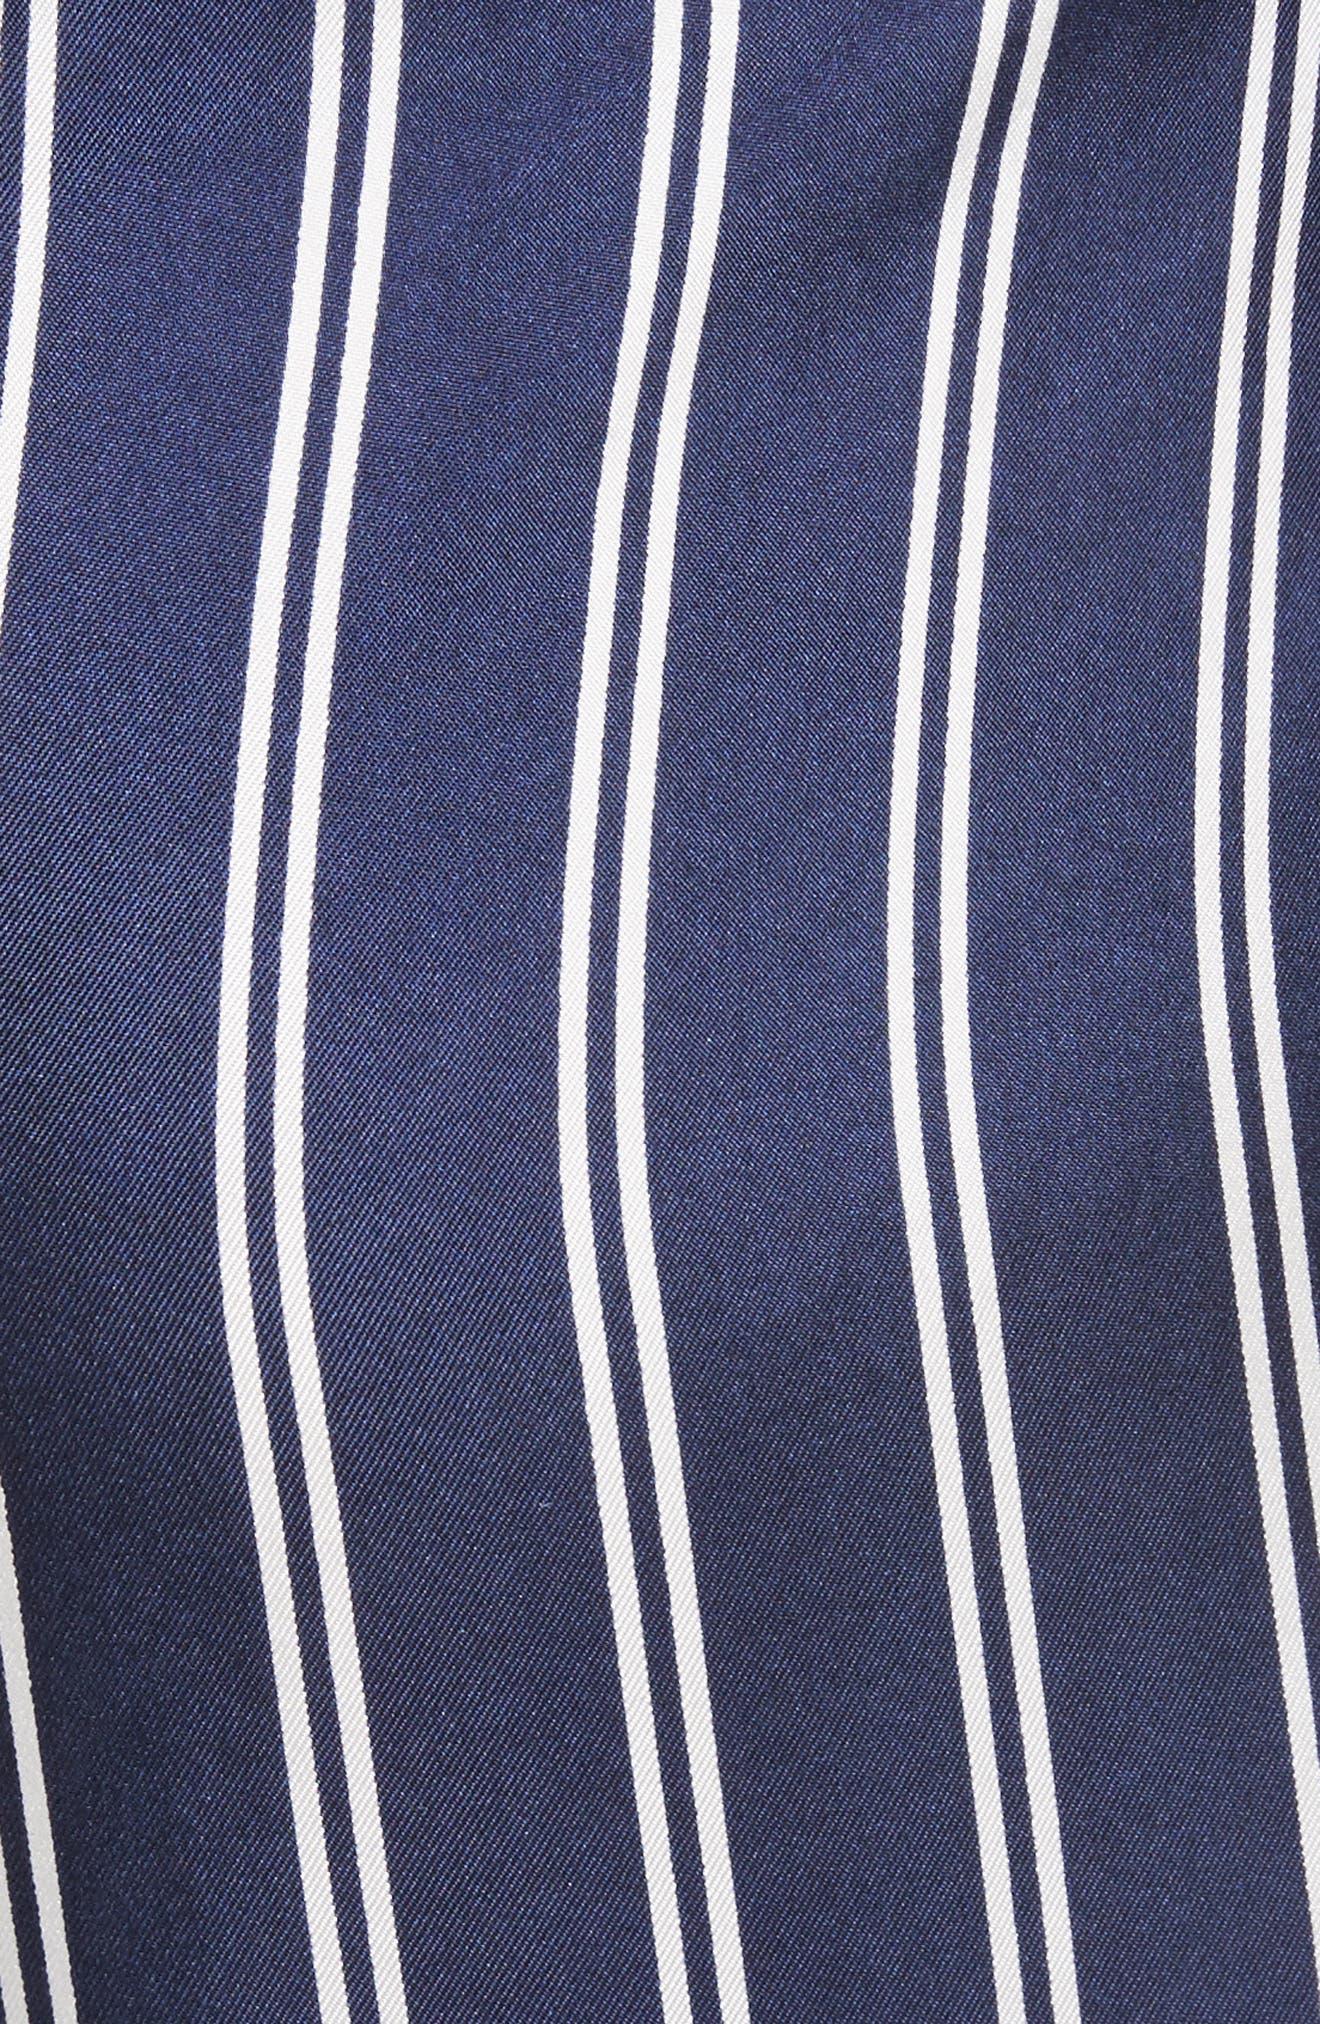 Addiena Stripe Silk Pants,                             Alternate thumbnail 5, color,                             Dark Navy